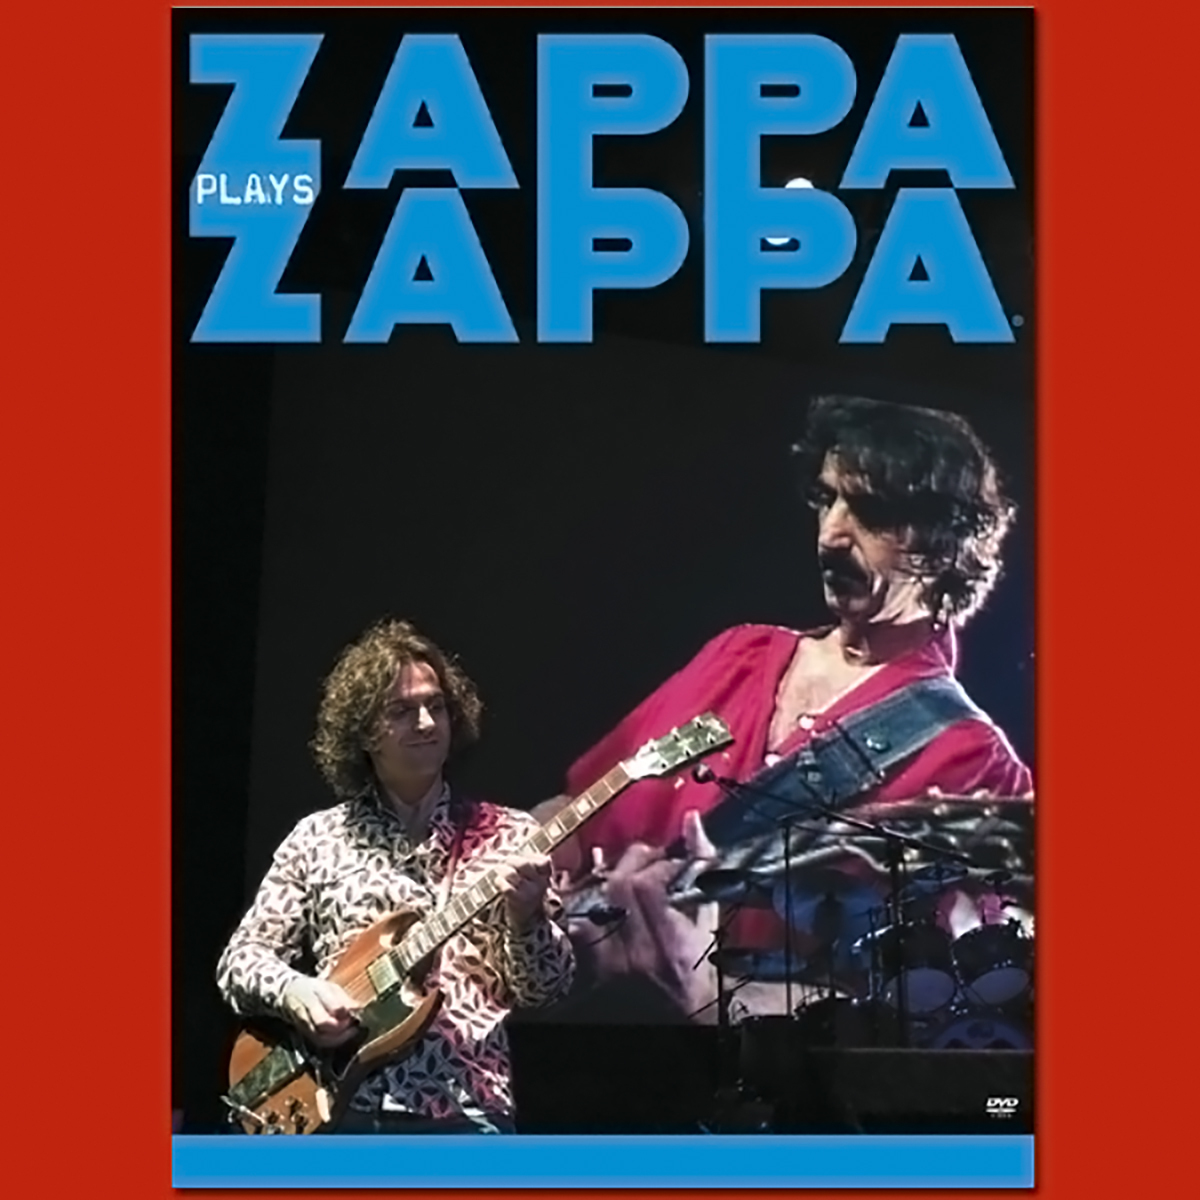 Zappa Plays Zappa on DVD